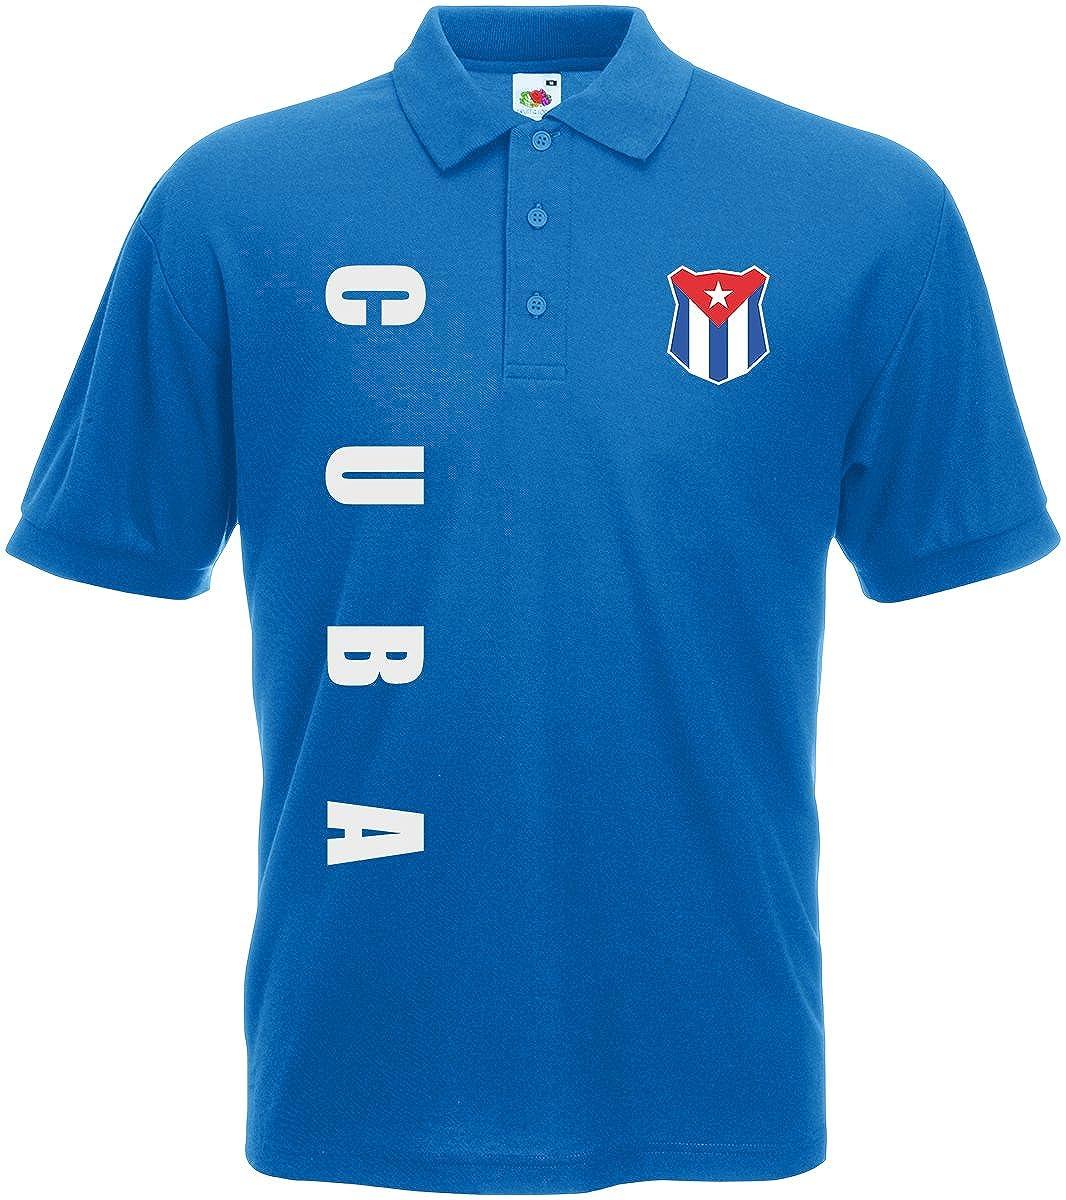 Kuba Cuba Polo-Shirt Trikot Wunschname Wunschnummer